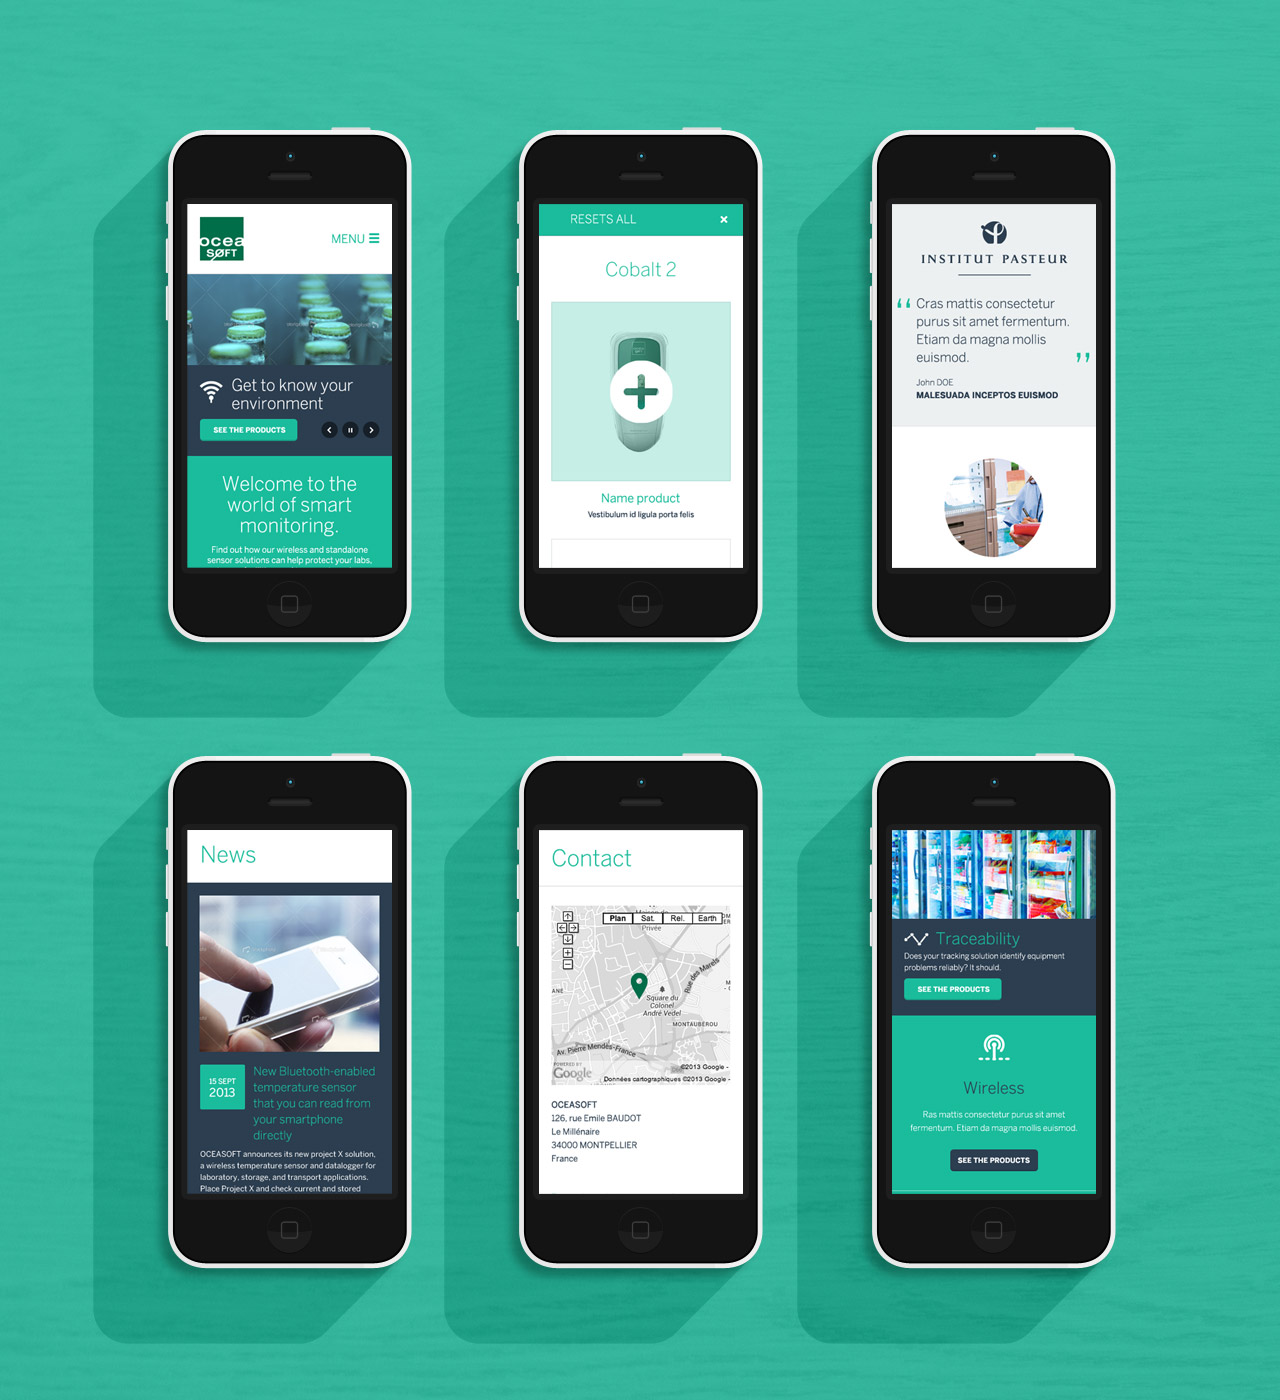 oceasoft-site-mobile-responsive-design-creation-communication-caconcept-alexis-cretin-graphiste